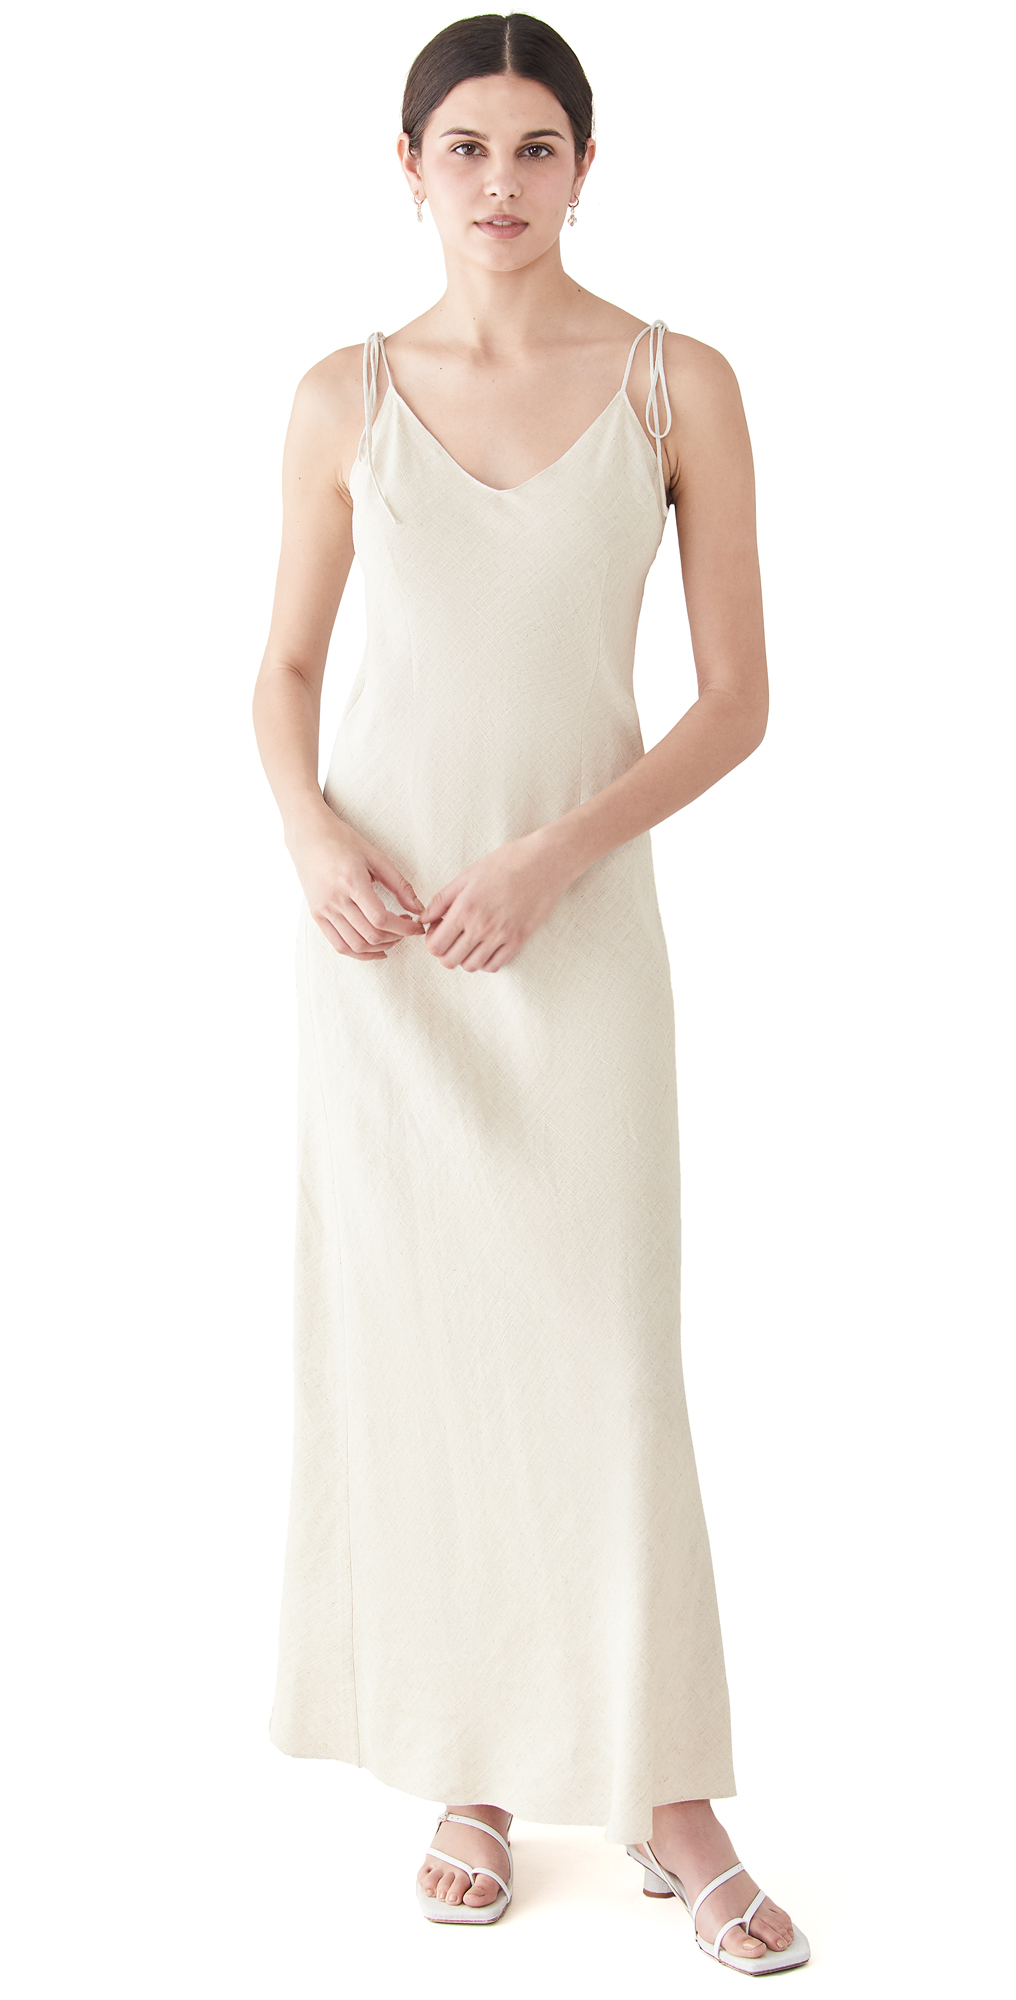 Linen Tie Strap Dress